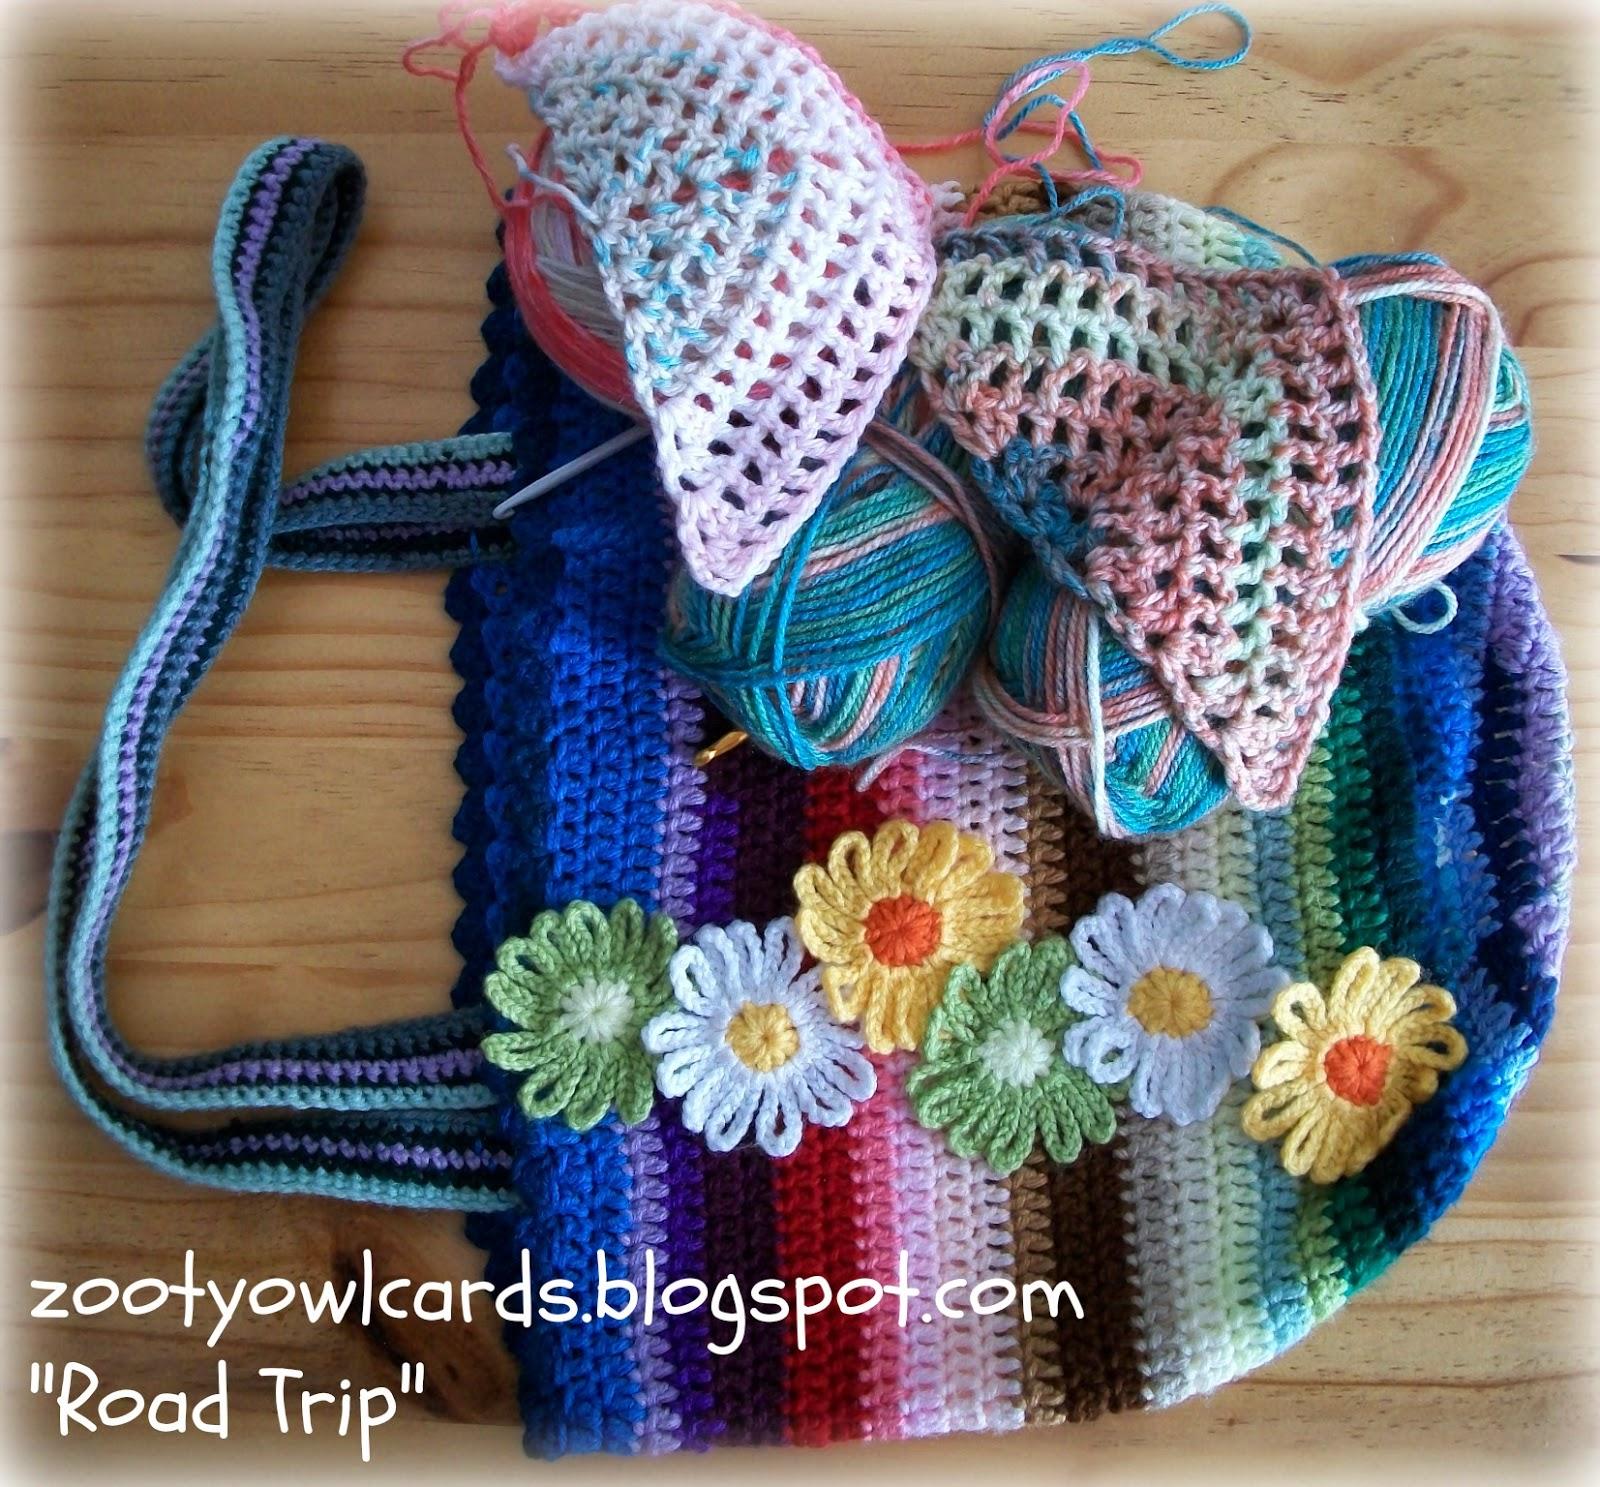 Zooty Owls Crafty Blog: Road Trip Scarves: Pattern